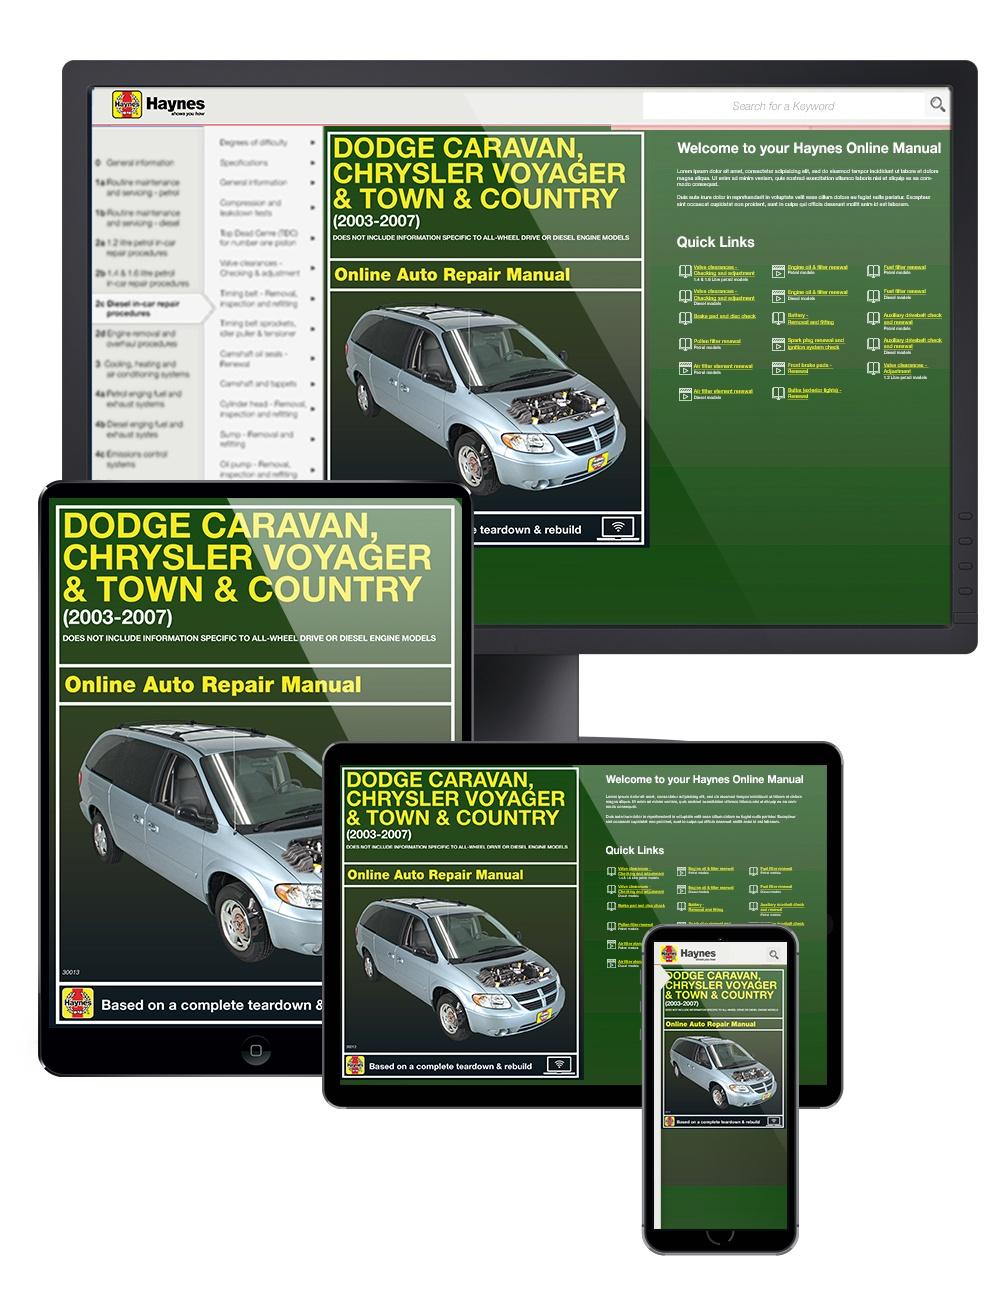 Manual cover for Dodge Caravan, Chrysler Voyager & Town & Country (03-07) Haynes Online Manual